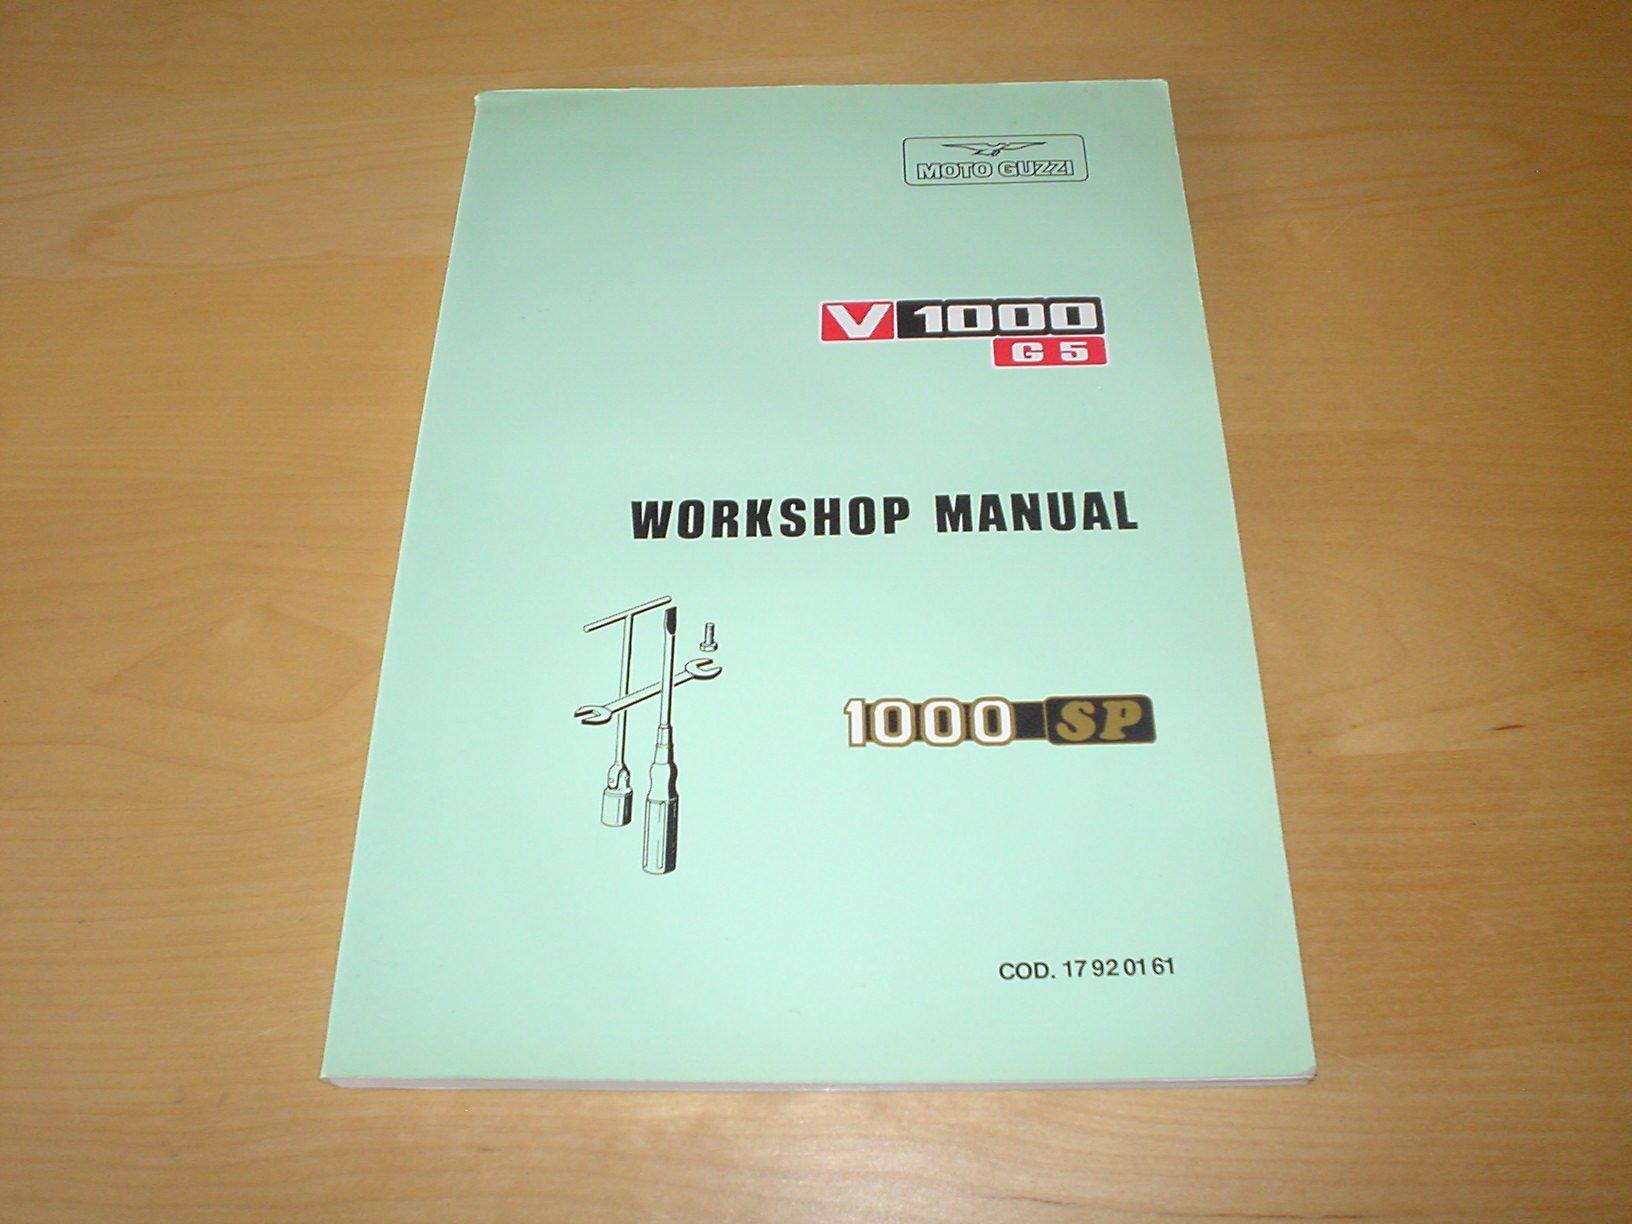 MOTO GUZZI V1000G5 & 1000SP OWNERS WORKSHOP REPAIR MANUAL HANDBOOK - V 1000  G5 SP V1000 V1000 G5 - OWNERS HANDBOOK MANUAL - - BIKE HAND BOOK:  Amazon.co.uk: ...